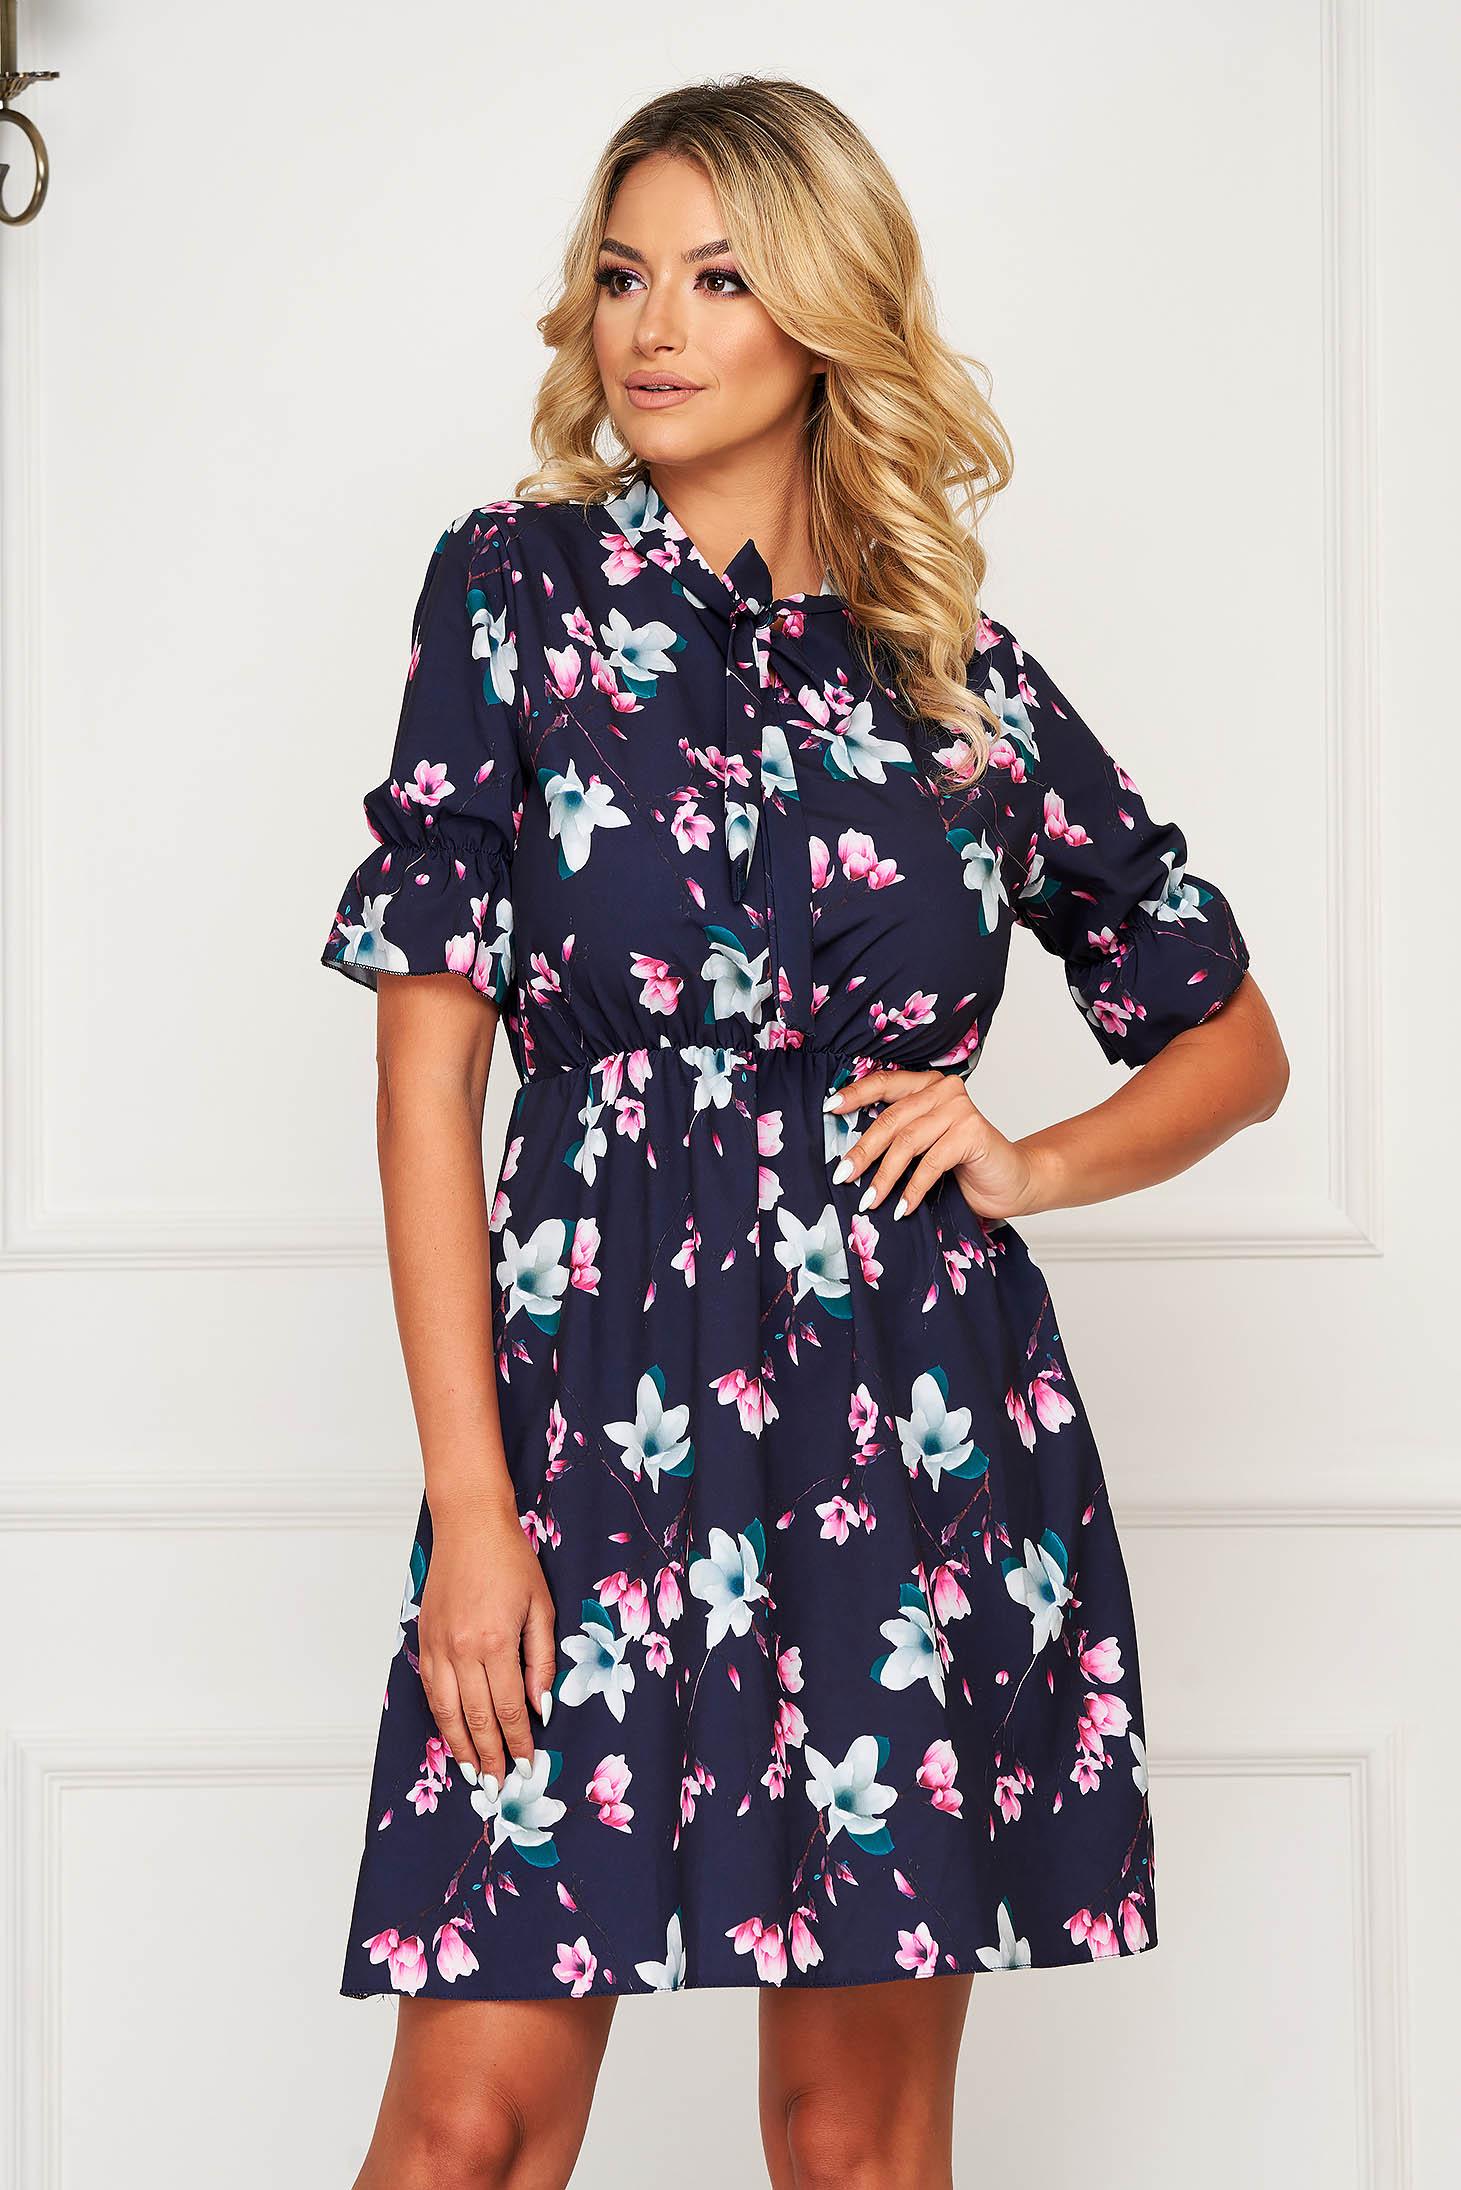 Darkblue dress short cut daily thin fabric cloche with elastic waist short sleeves